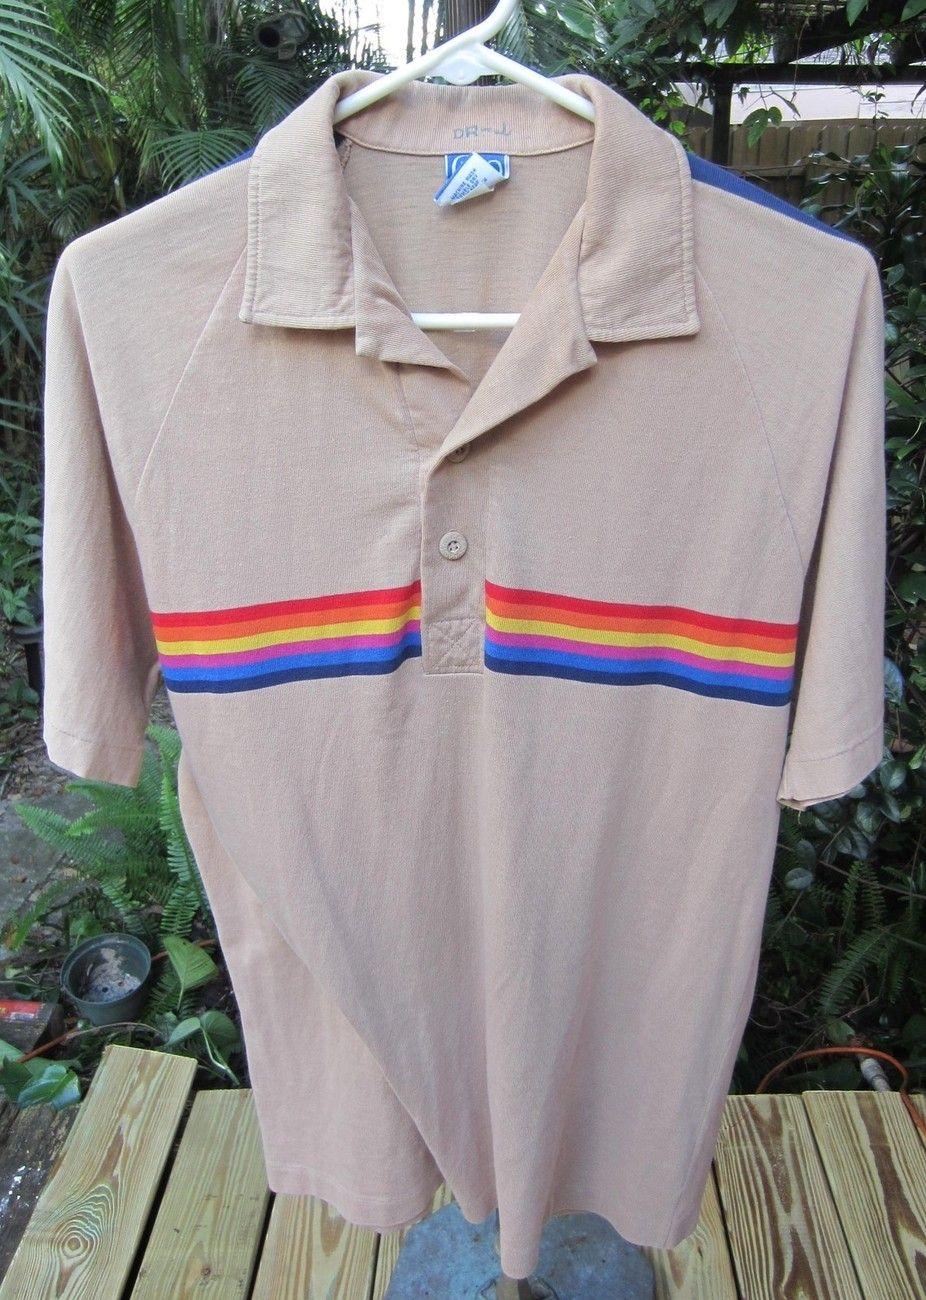 Vintage Large Polo Shirt Op Ocean Pacific Sunwear Rainbow Design